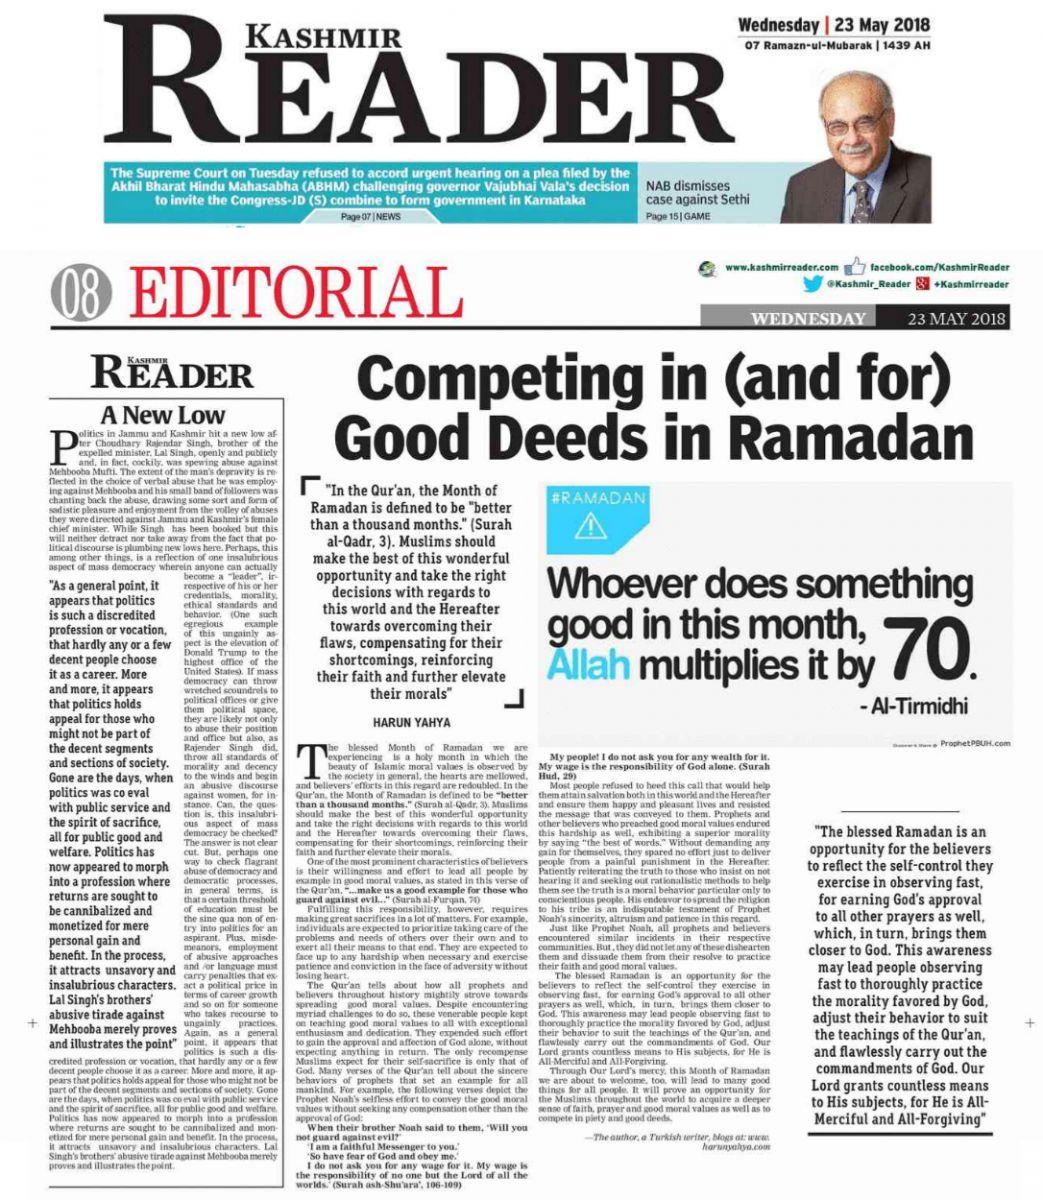 kashmir reader_adnan_oktar_competing_in_good_deeds_in_Ramadan